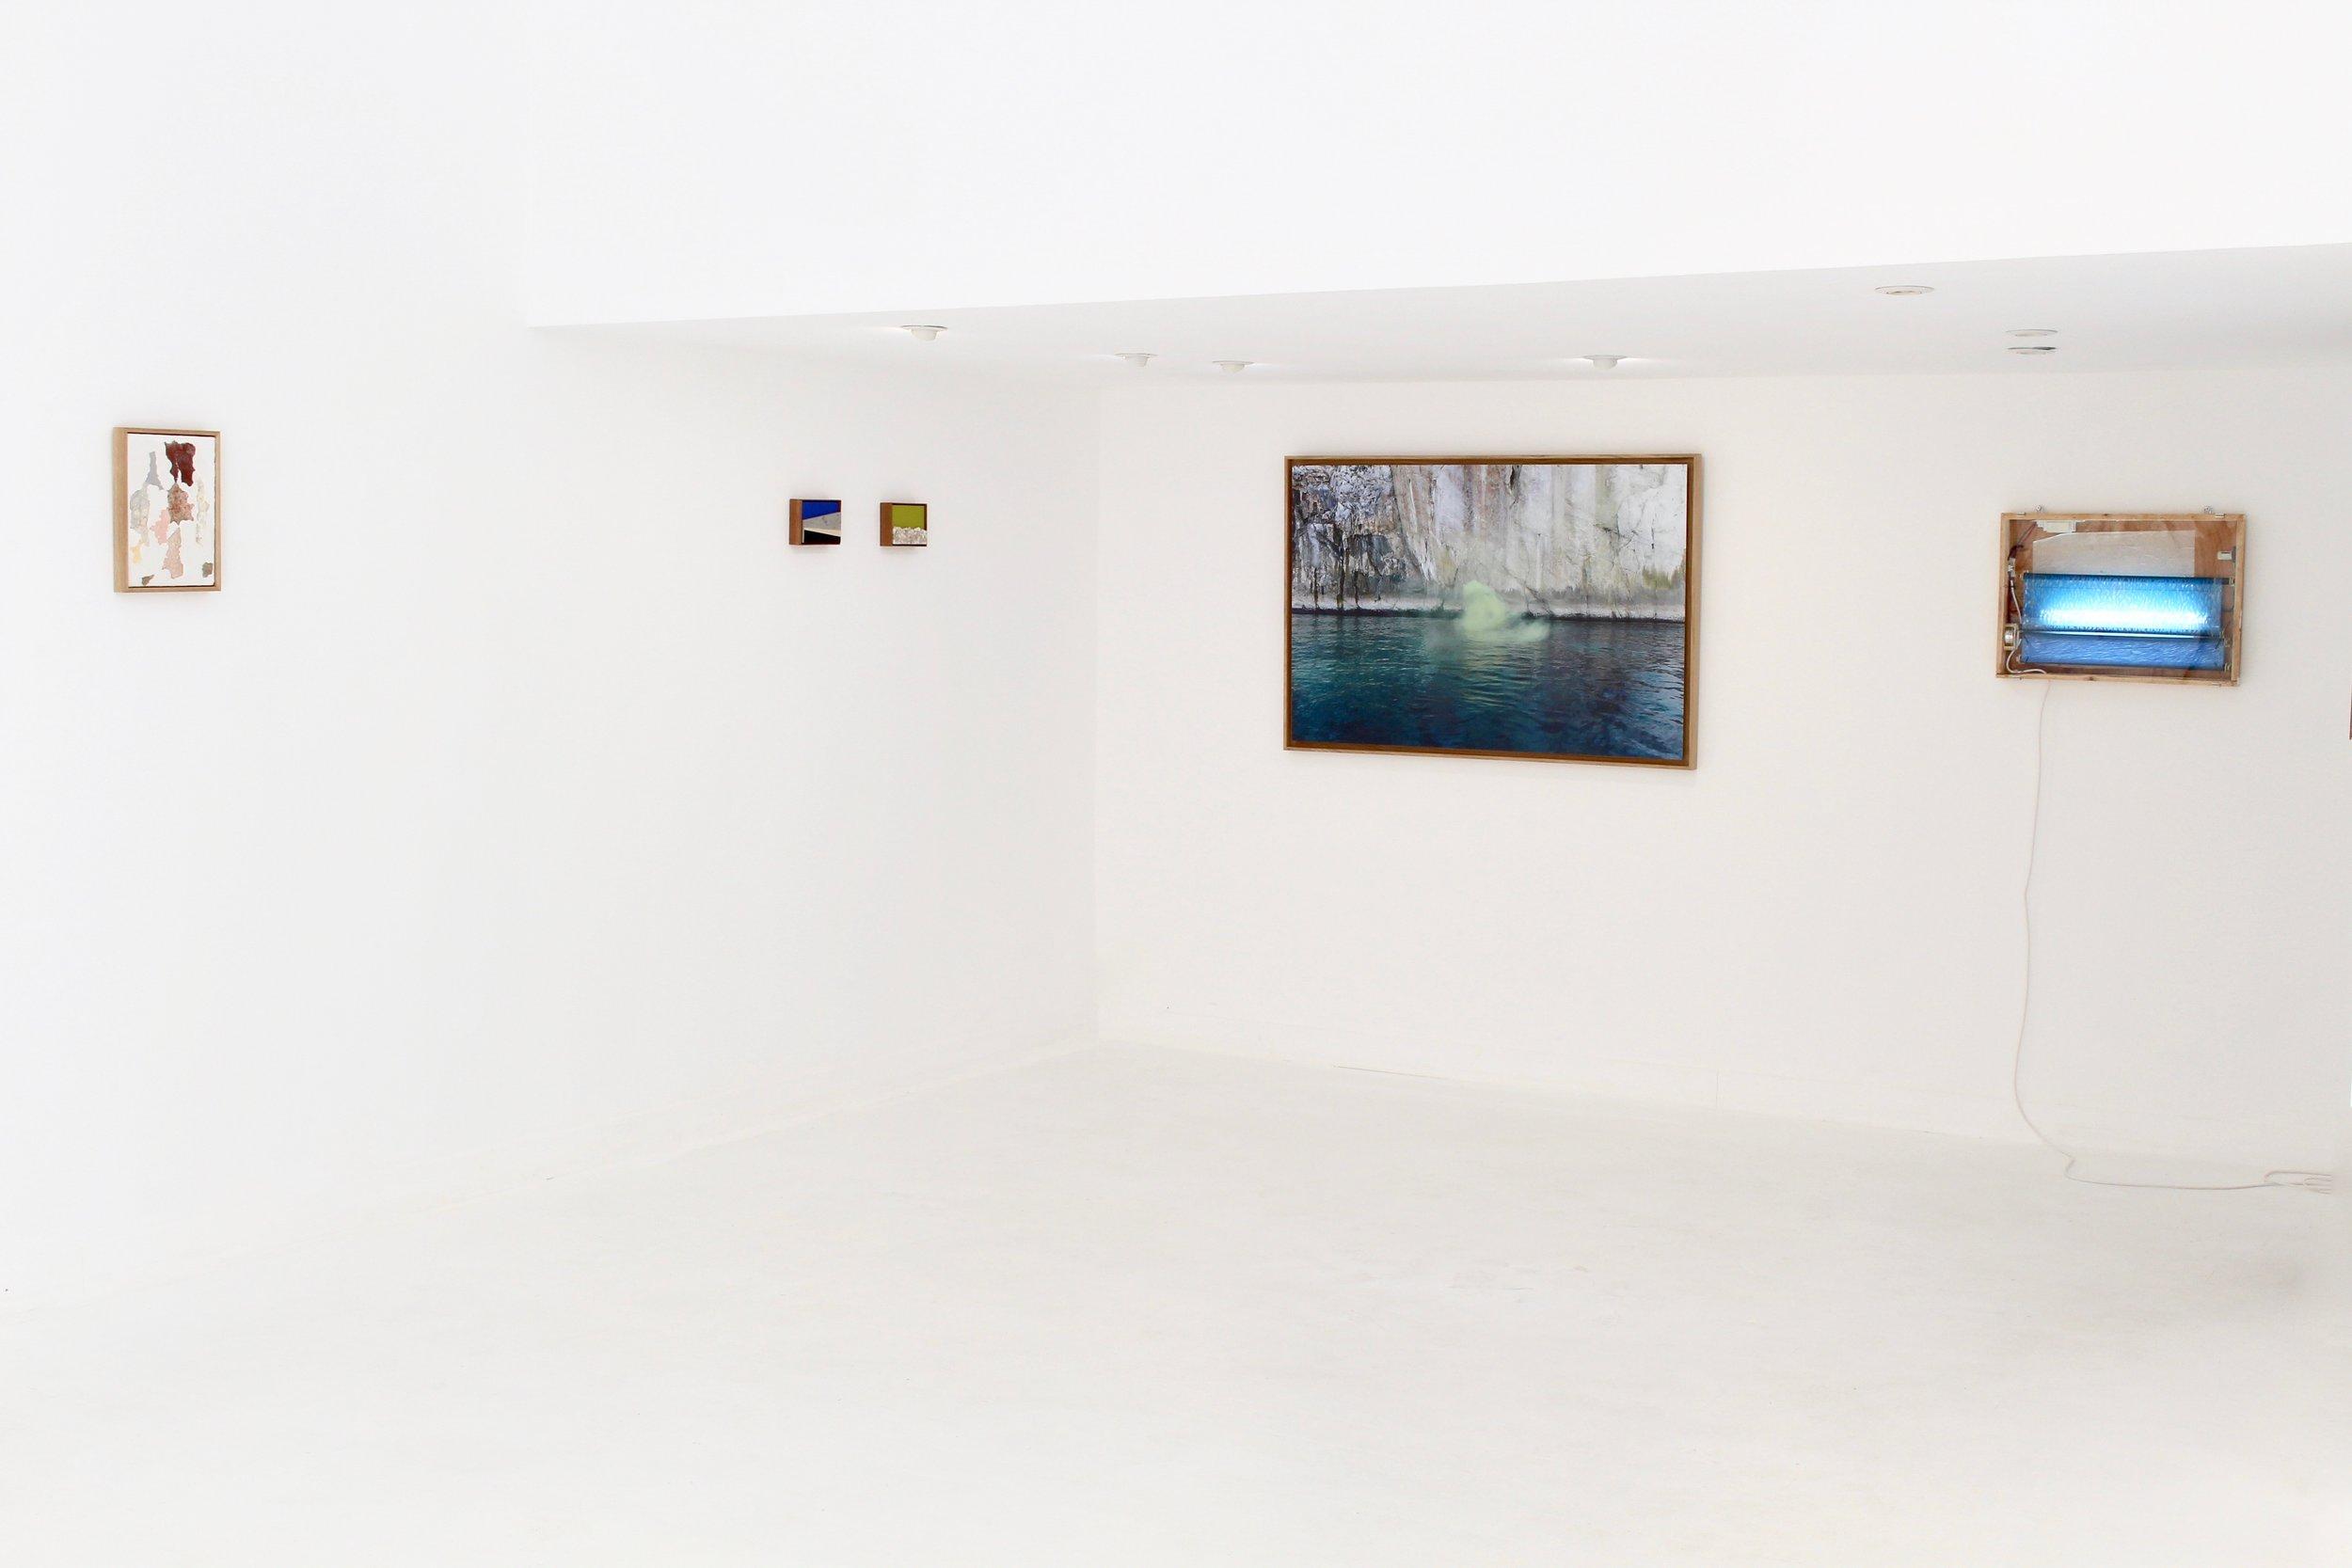 01 Manoela Medeiros_Charlie Warde_Filippo Minelli_Thierry Liègeois_ Double V Gallery.jpg